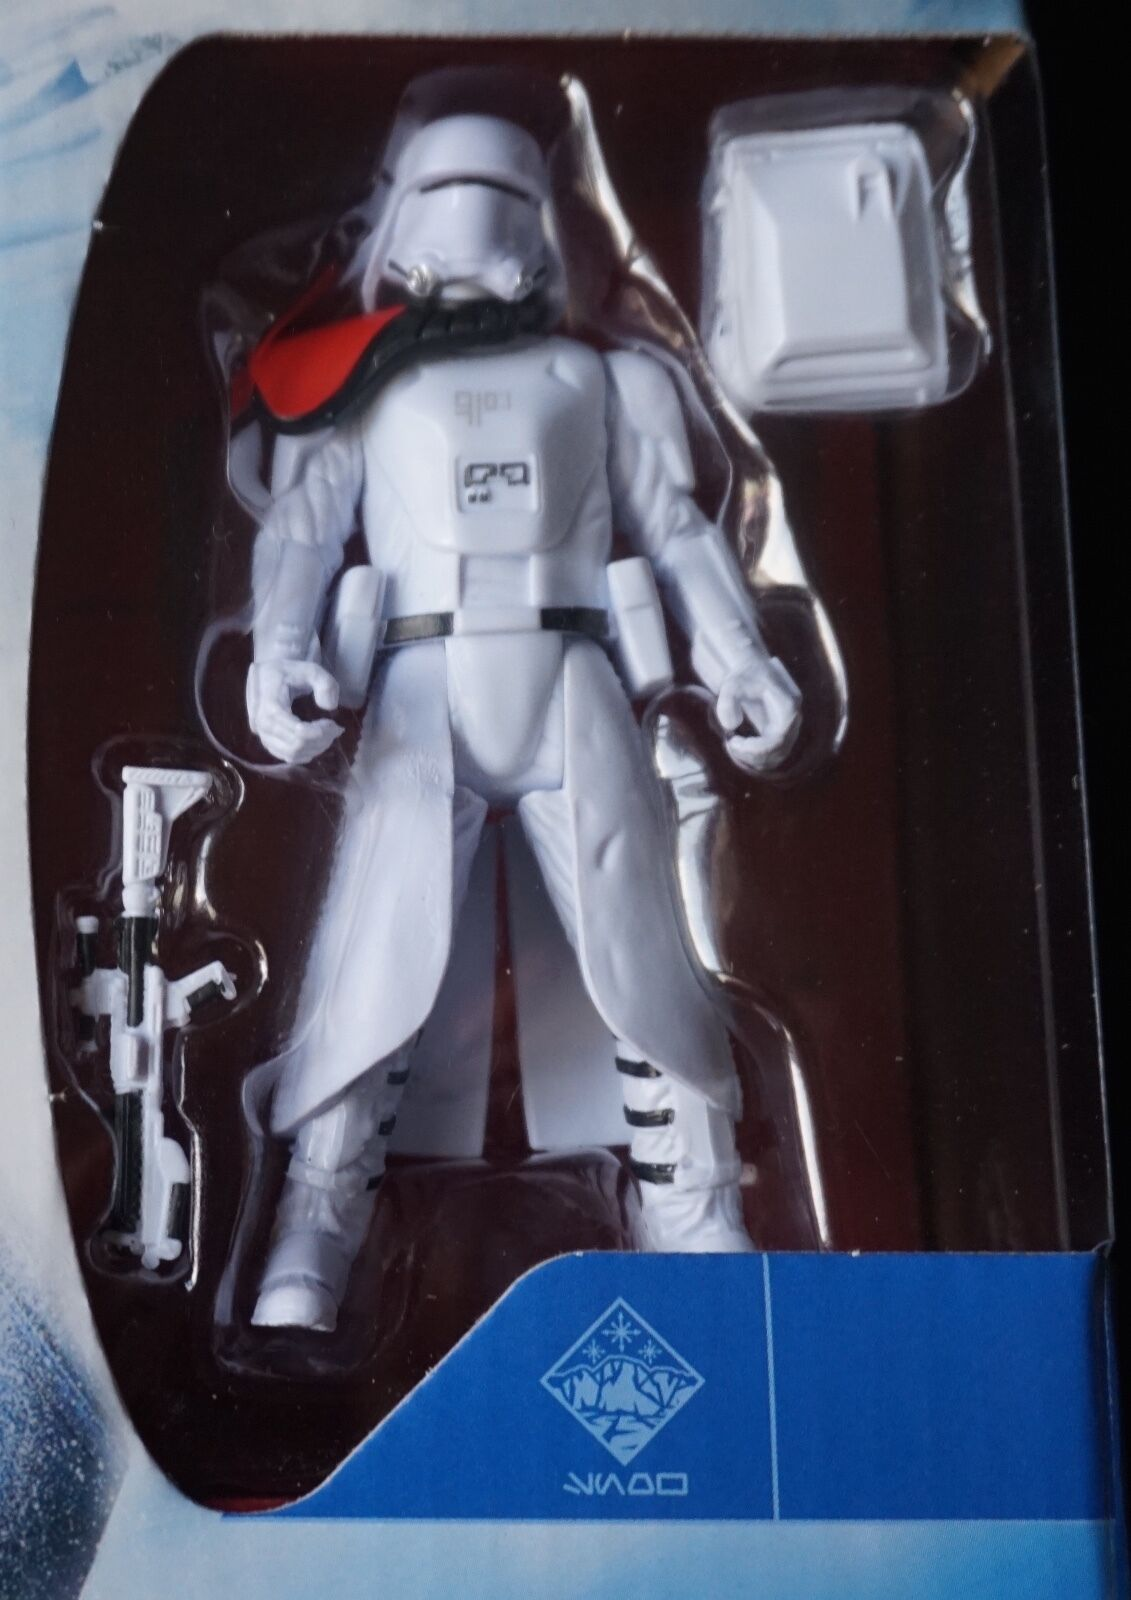 First Order Snowspeeder Snowspeeder Snowspeeder & Snowtrooper Officer   Star Wars   The Force Awakens 34d560